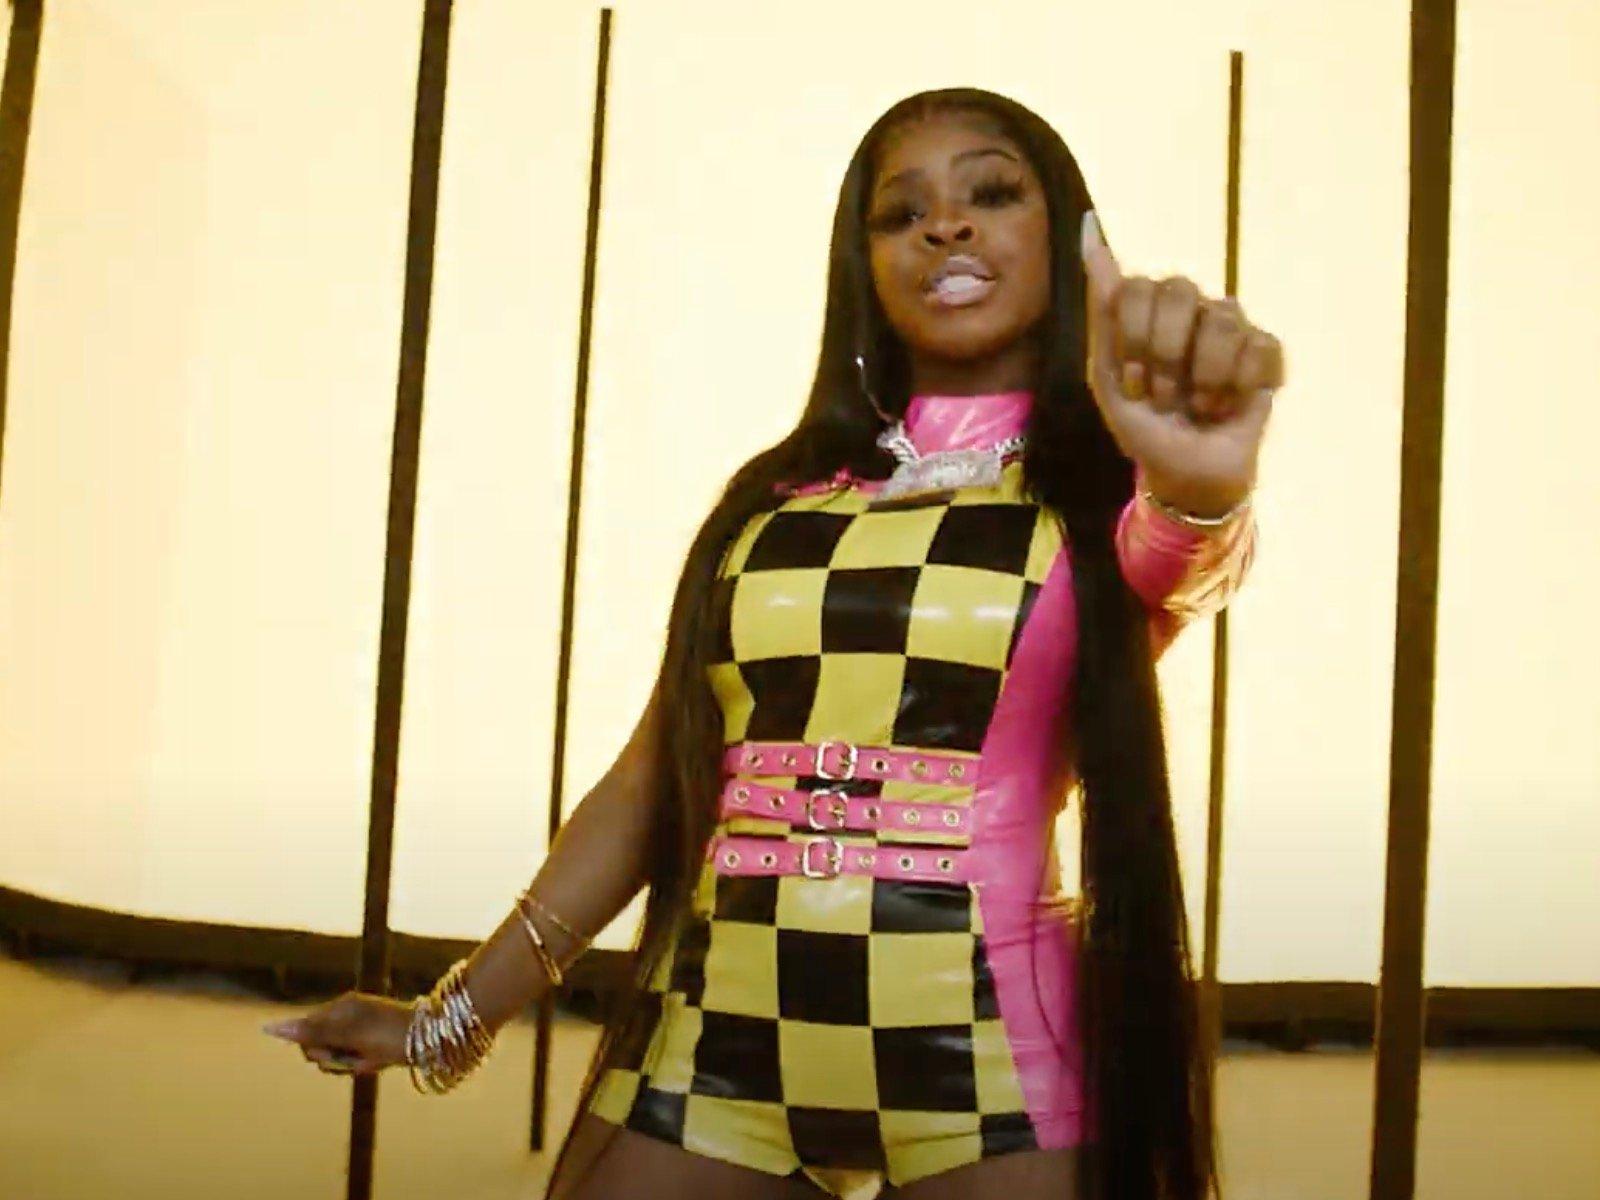 Moneybagg Yo City Girls DaBaby JT Yung Miami Said Sum Remix 2